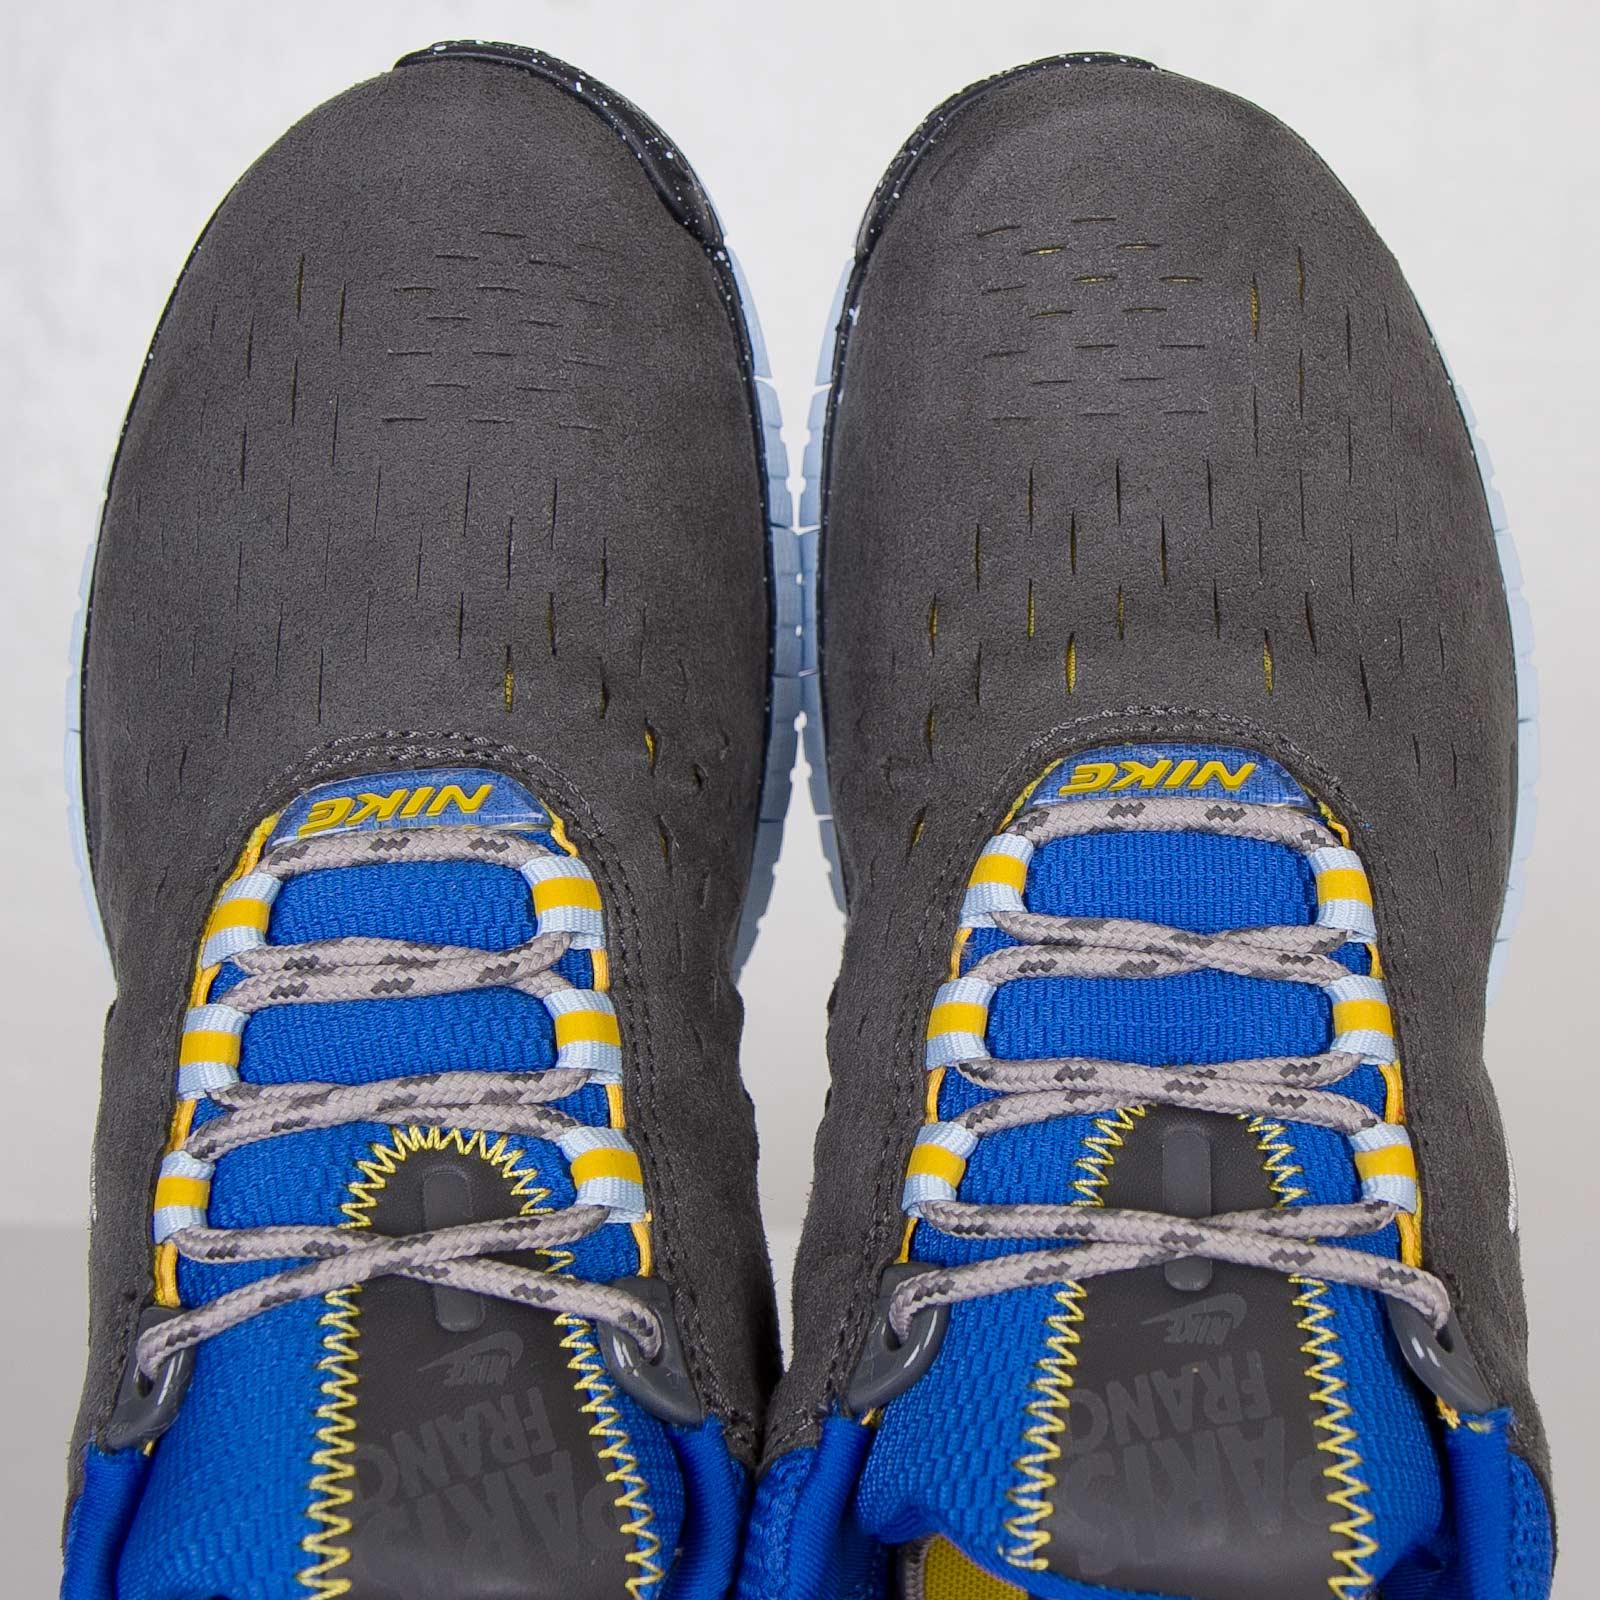 18a70639fda37 Nike Free OG ´14 City QS - 669595-090 - Sneakersnstuff